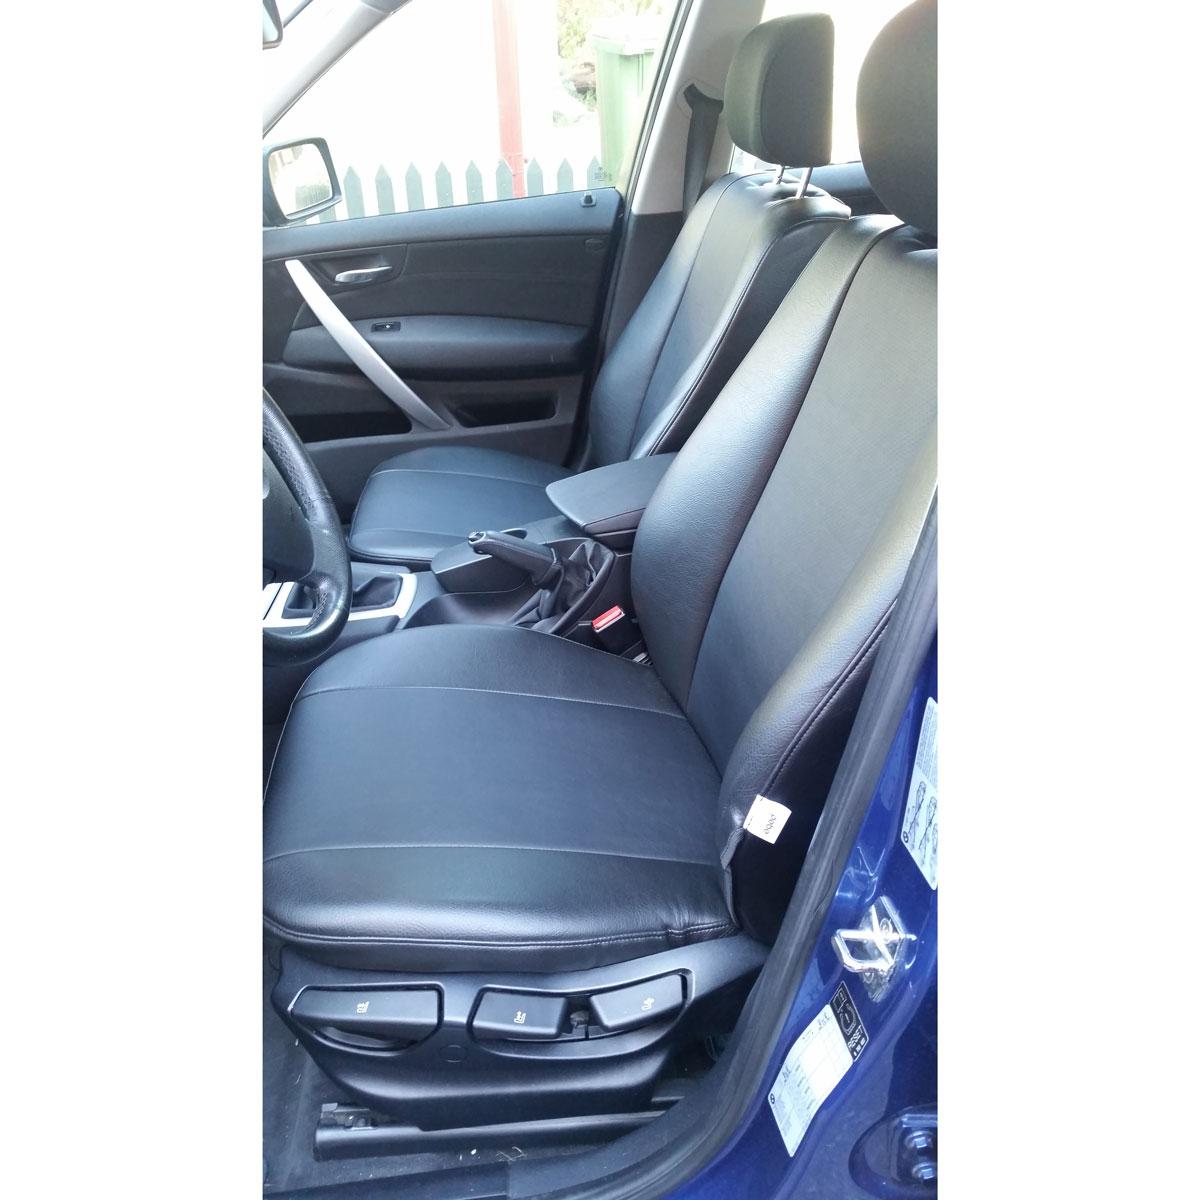 Stark Plus Bilklädsel passande Volvo S40